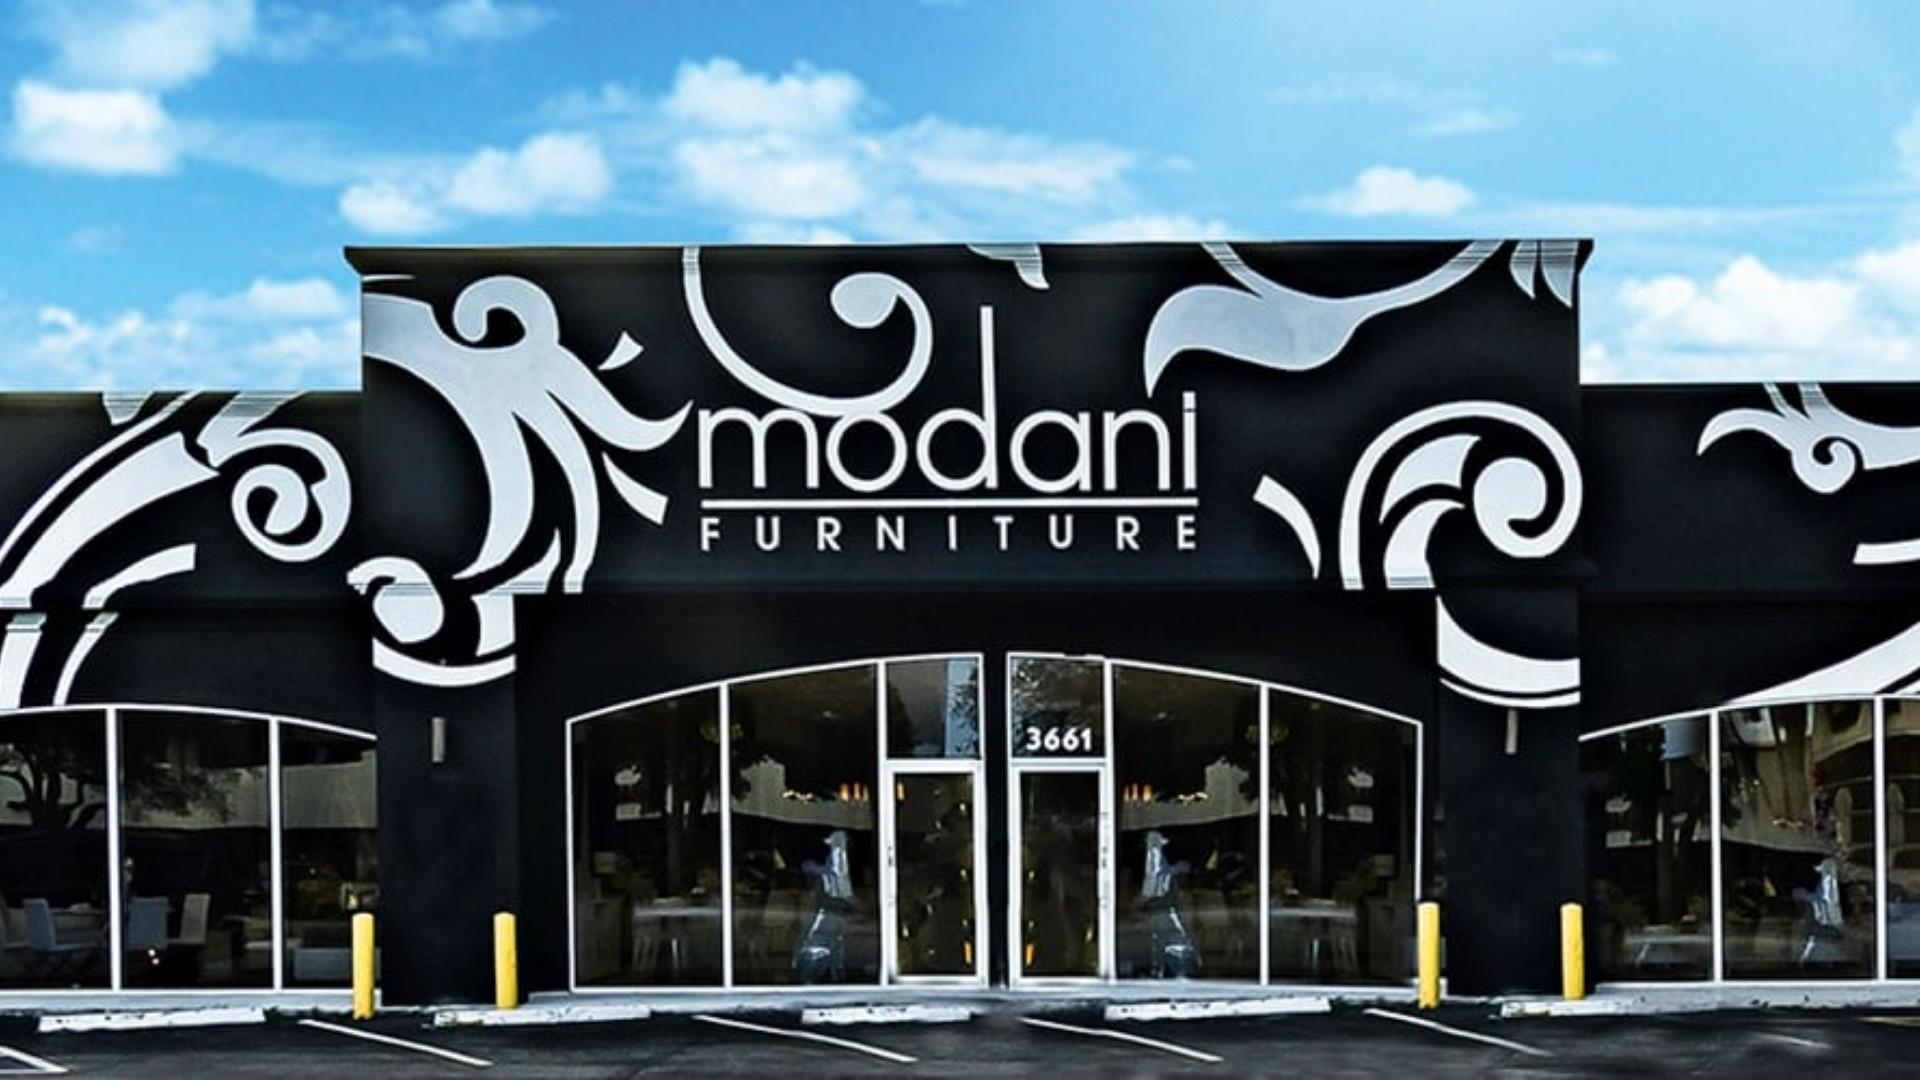 Modani Furniture Costa Mesa reviews | Furniture Stores at 3309-F Hyland Ave - Costa Mesa CA